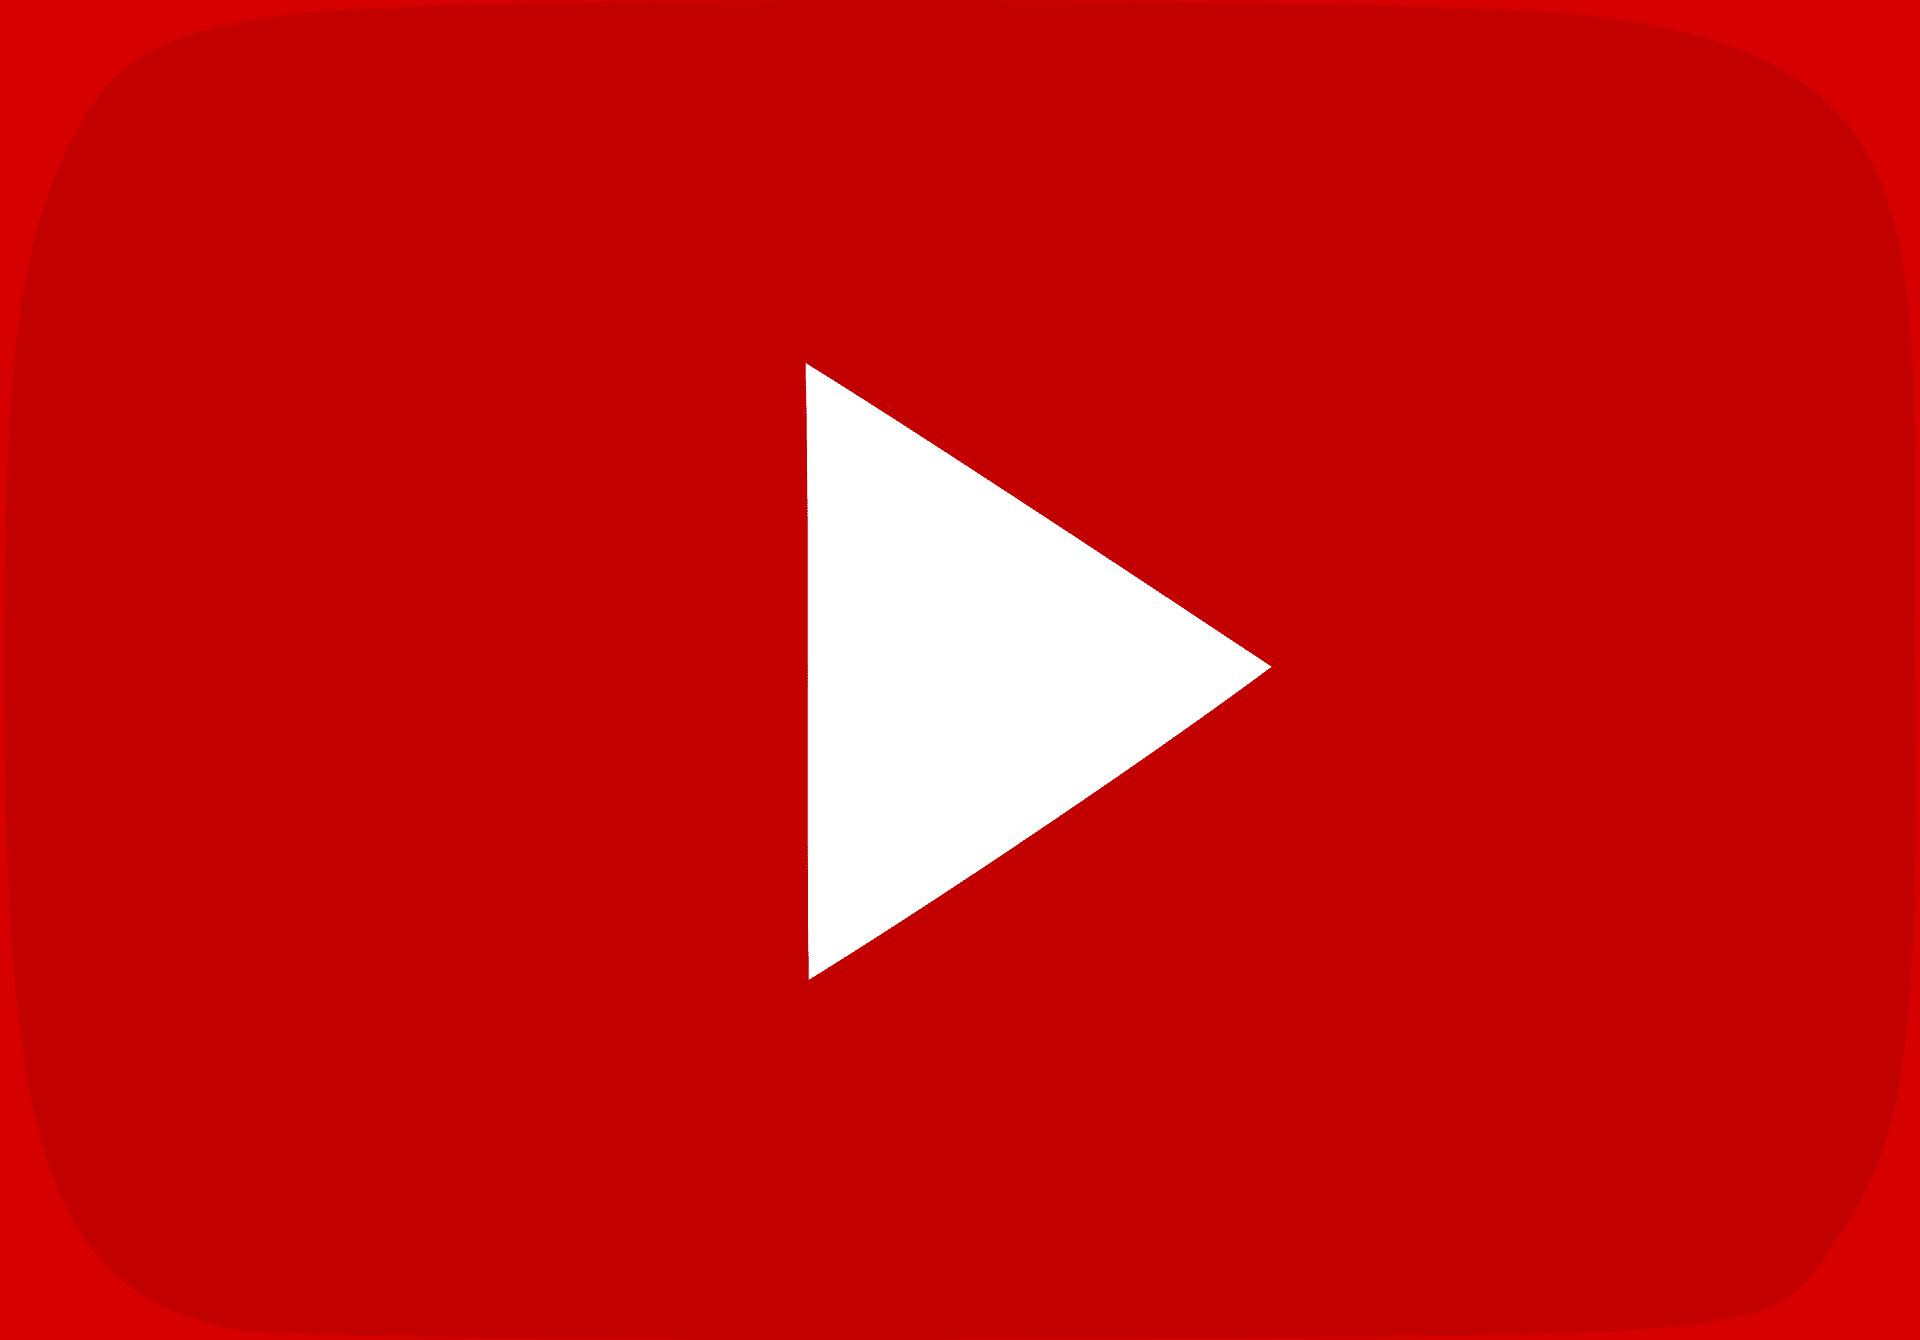 youtube-1495277_1920